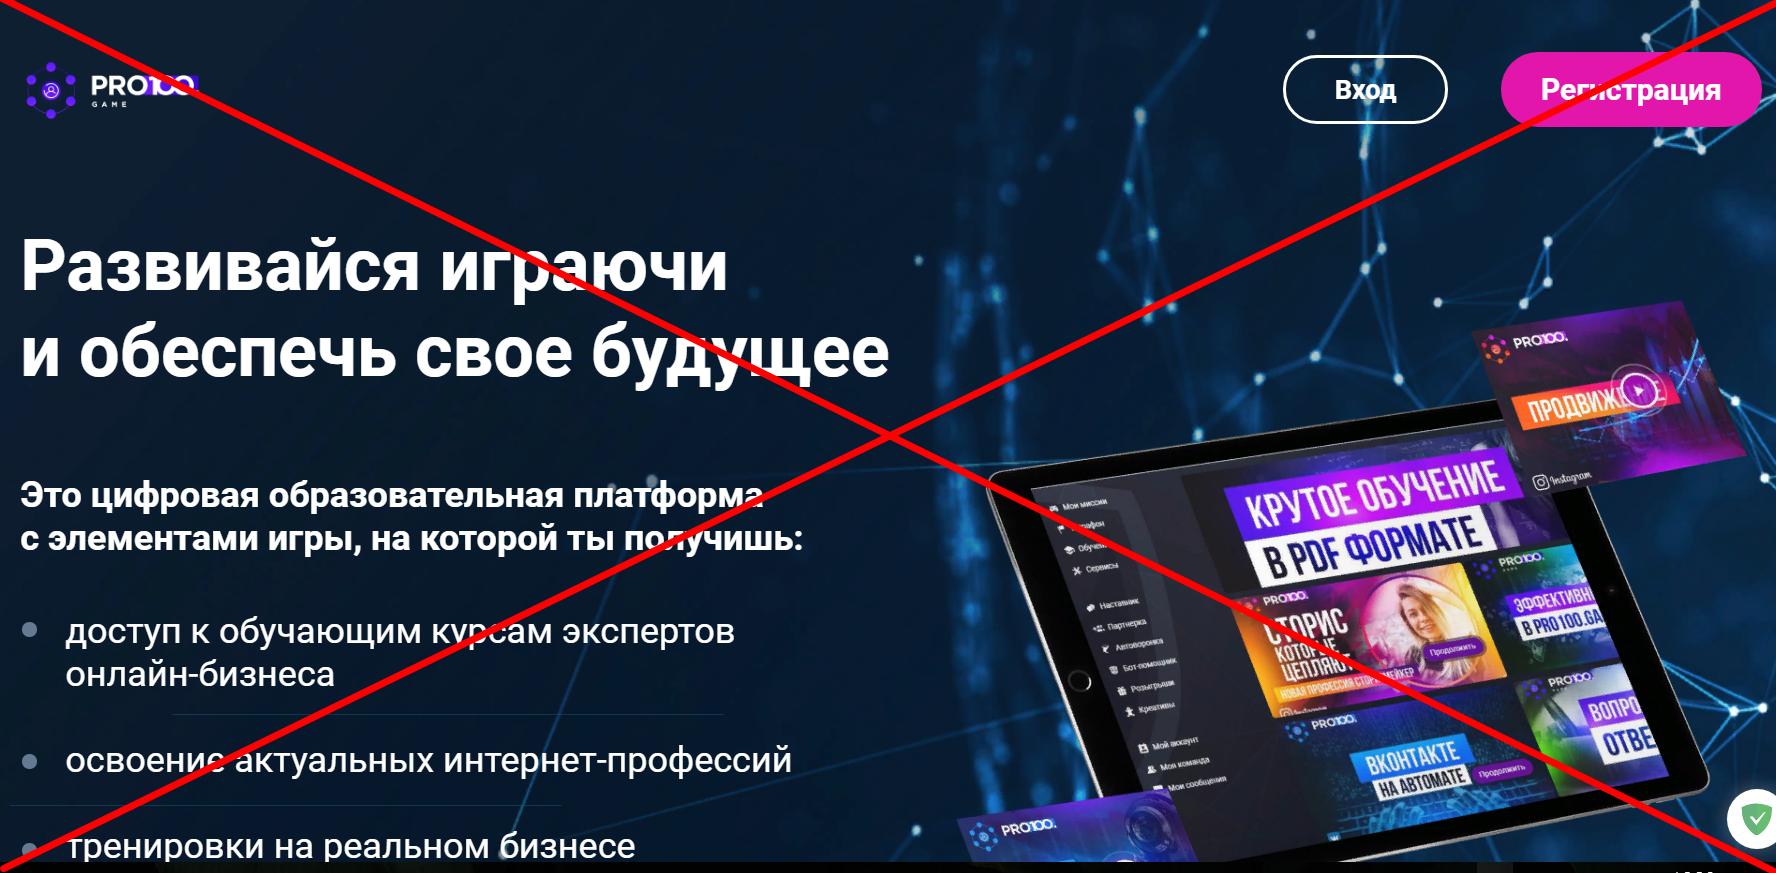 Pro100Game - отзывы и маркетинг